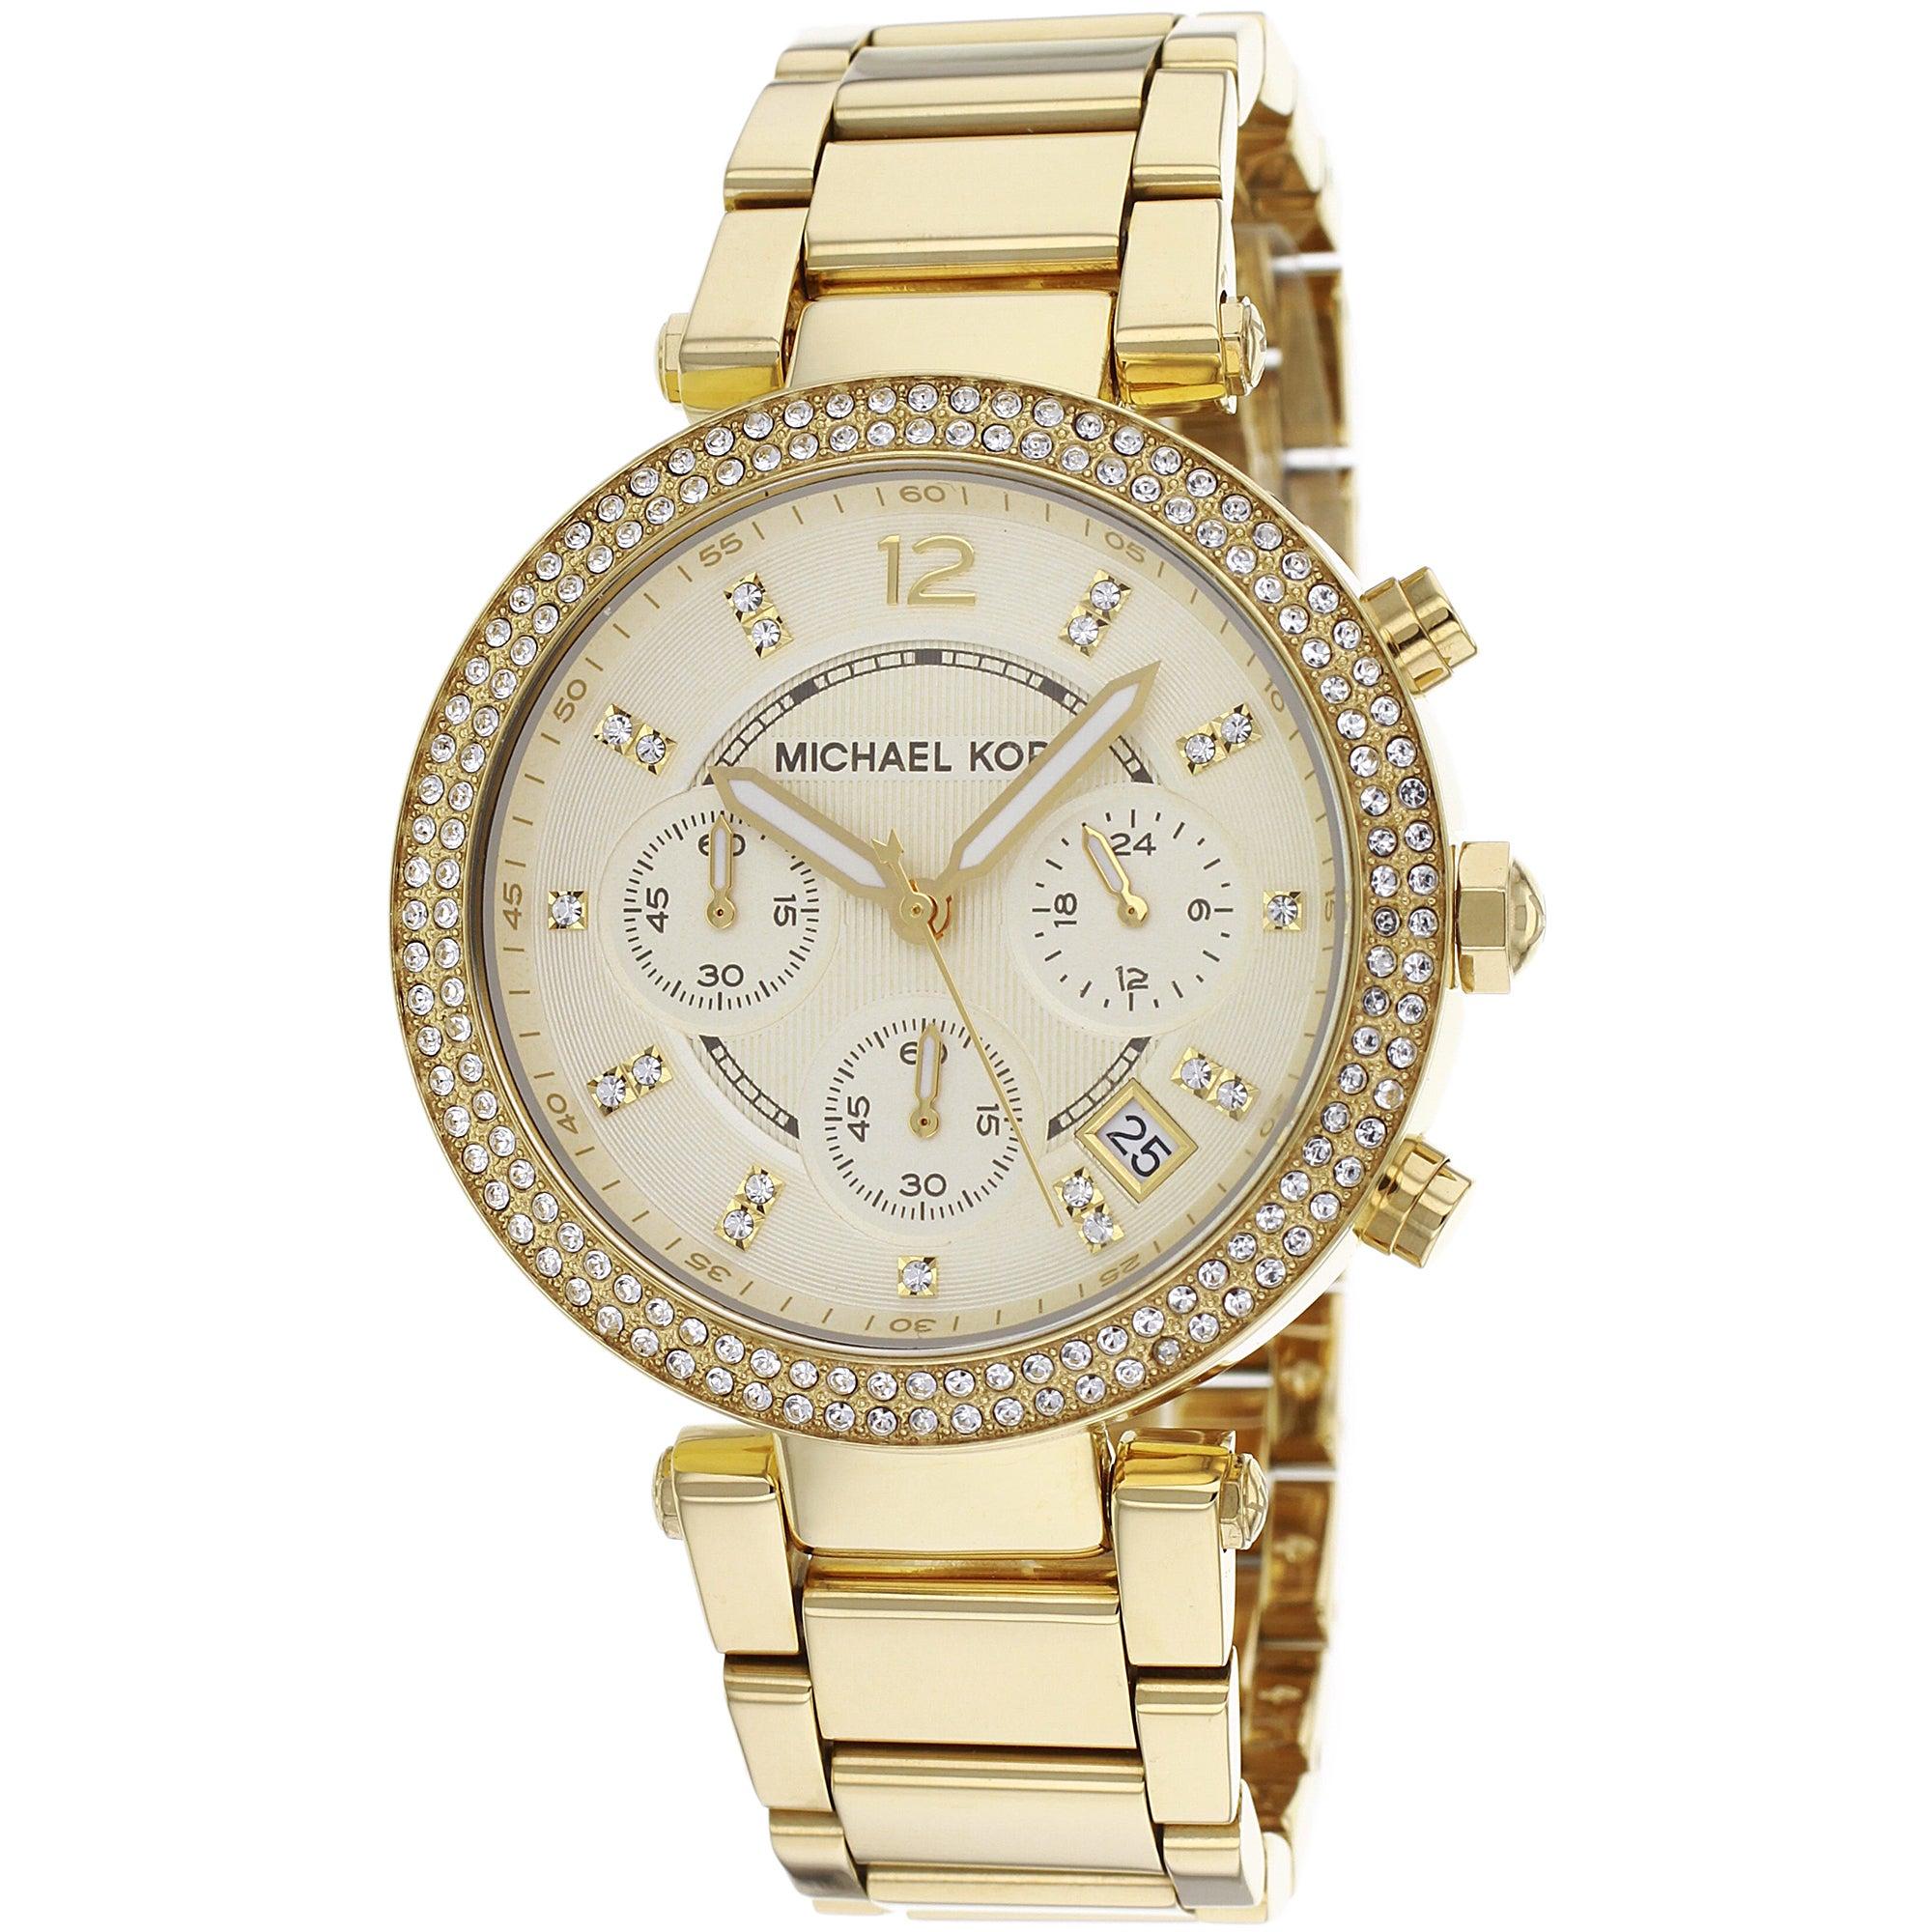 7b9f47926302 Michael Kors Women s MK5354  Parker  Yellow Gold Stainless Steel Watch